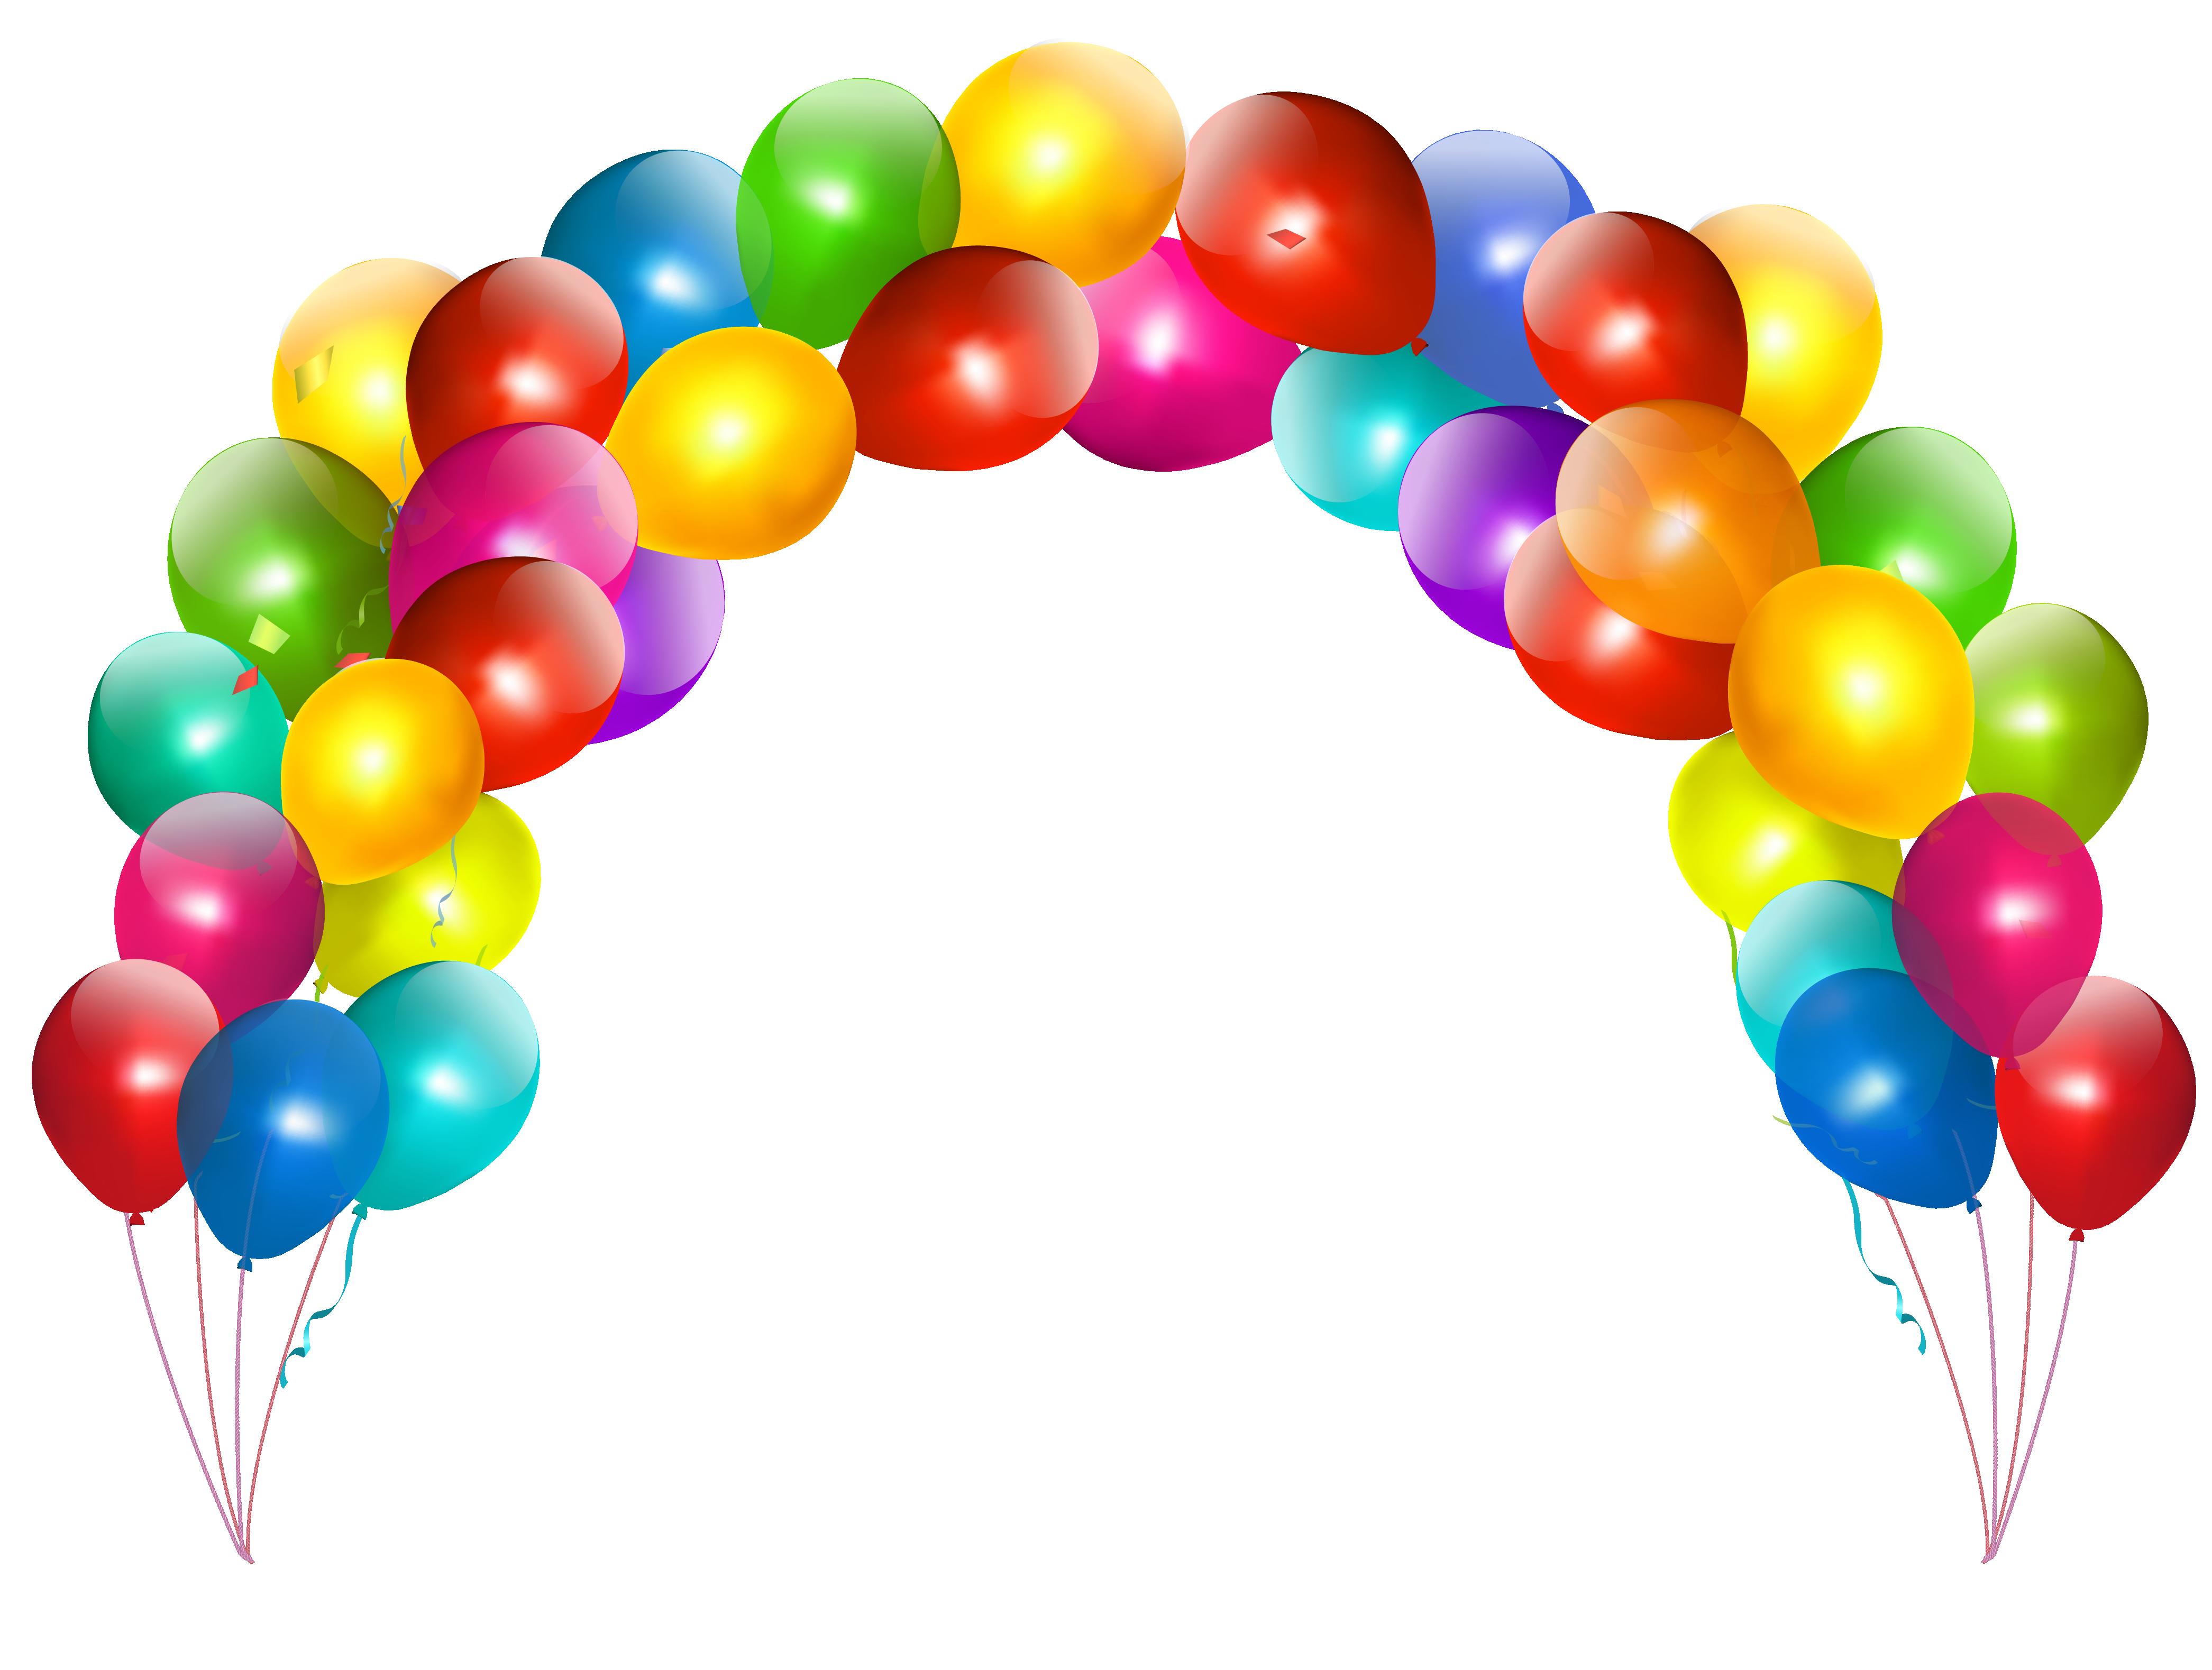 Arch clipart colorful balloon Clipart Clipart Book Balloon Arch